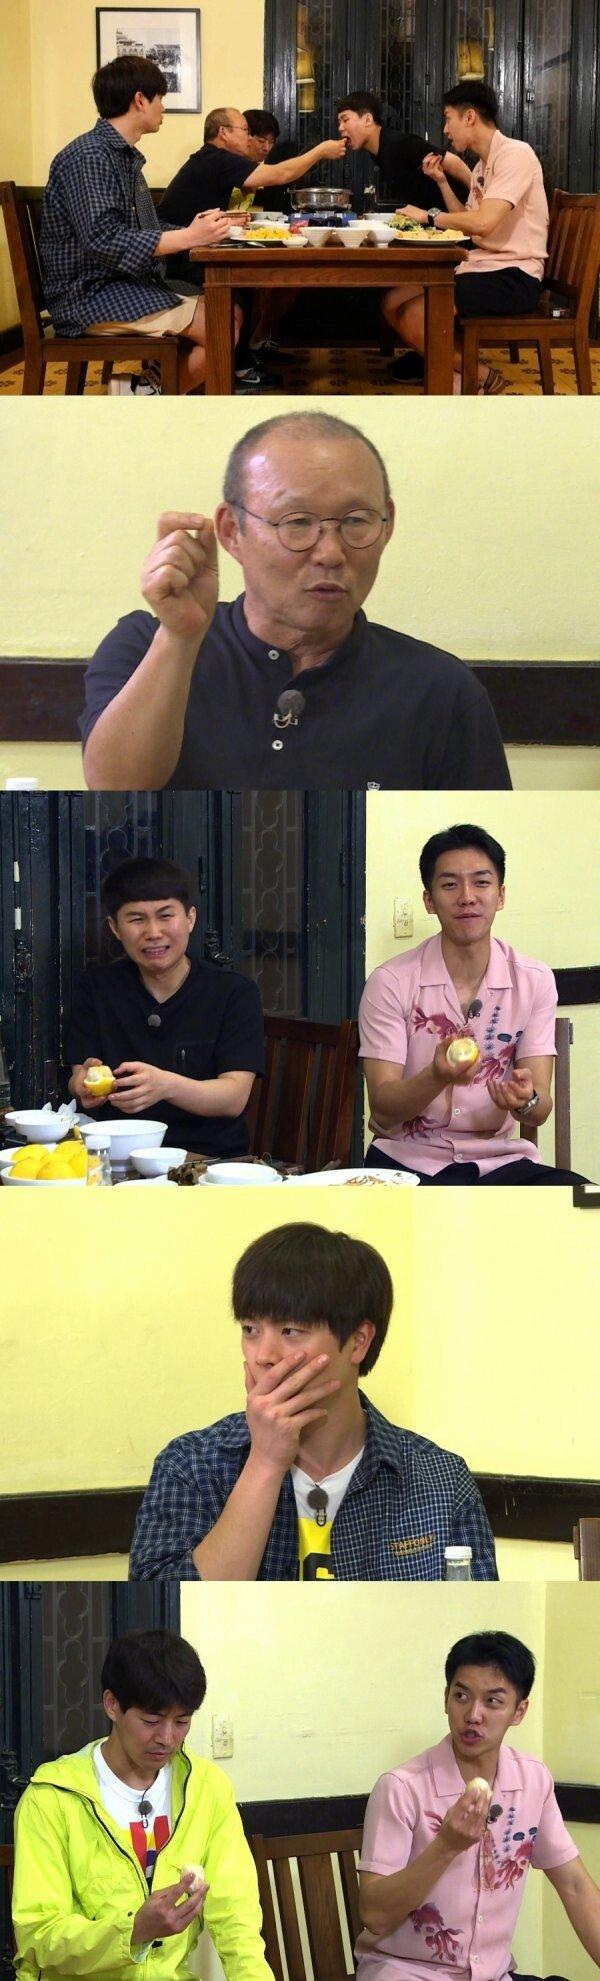 "[DAY컷] ""10억짜리 선물 걸렸다""… '집사부일체' 美친 레몬 먹기"